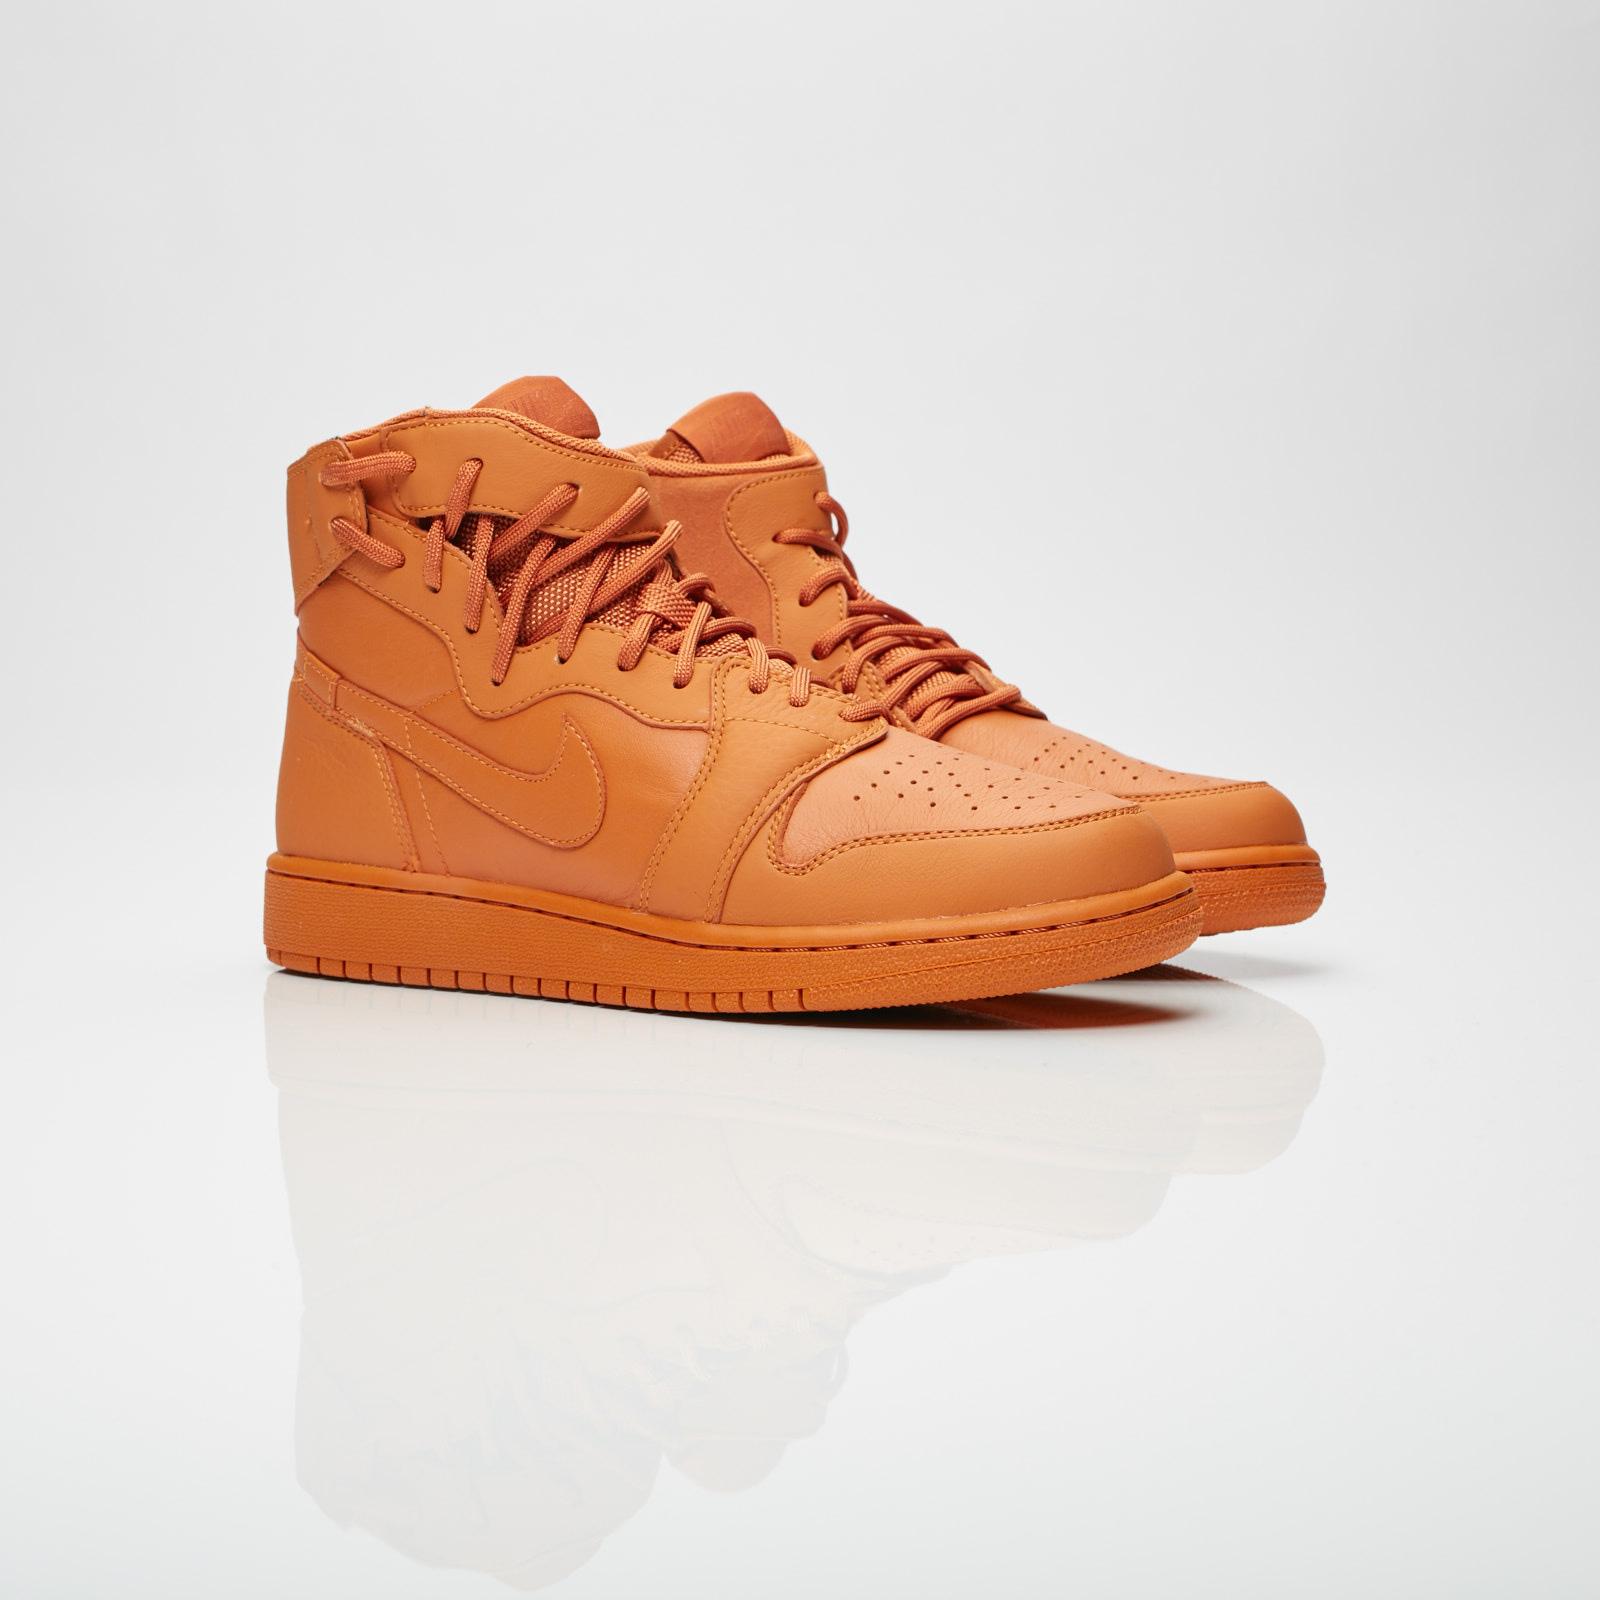 on sale 70183 53eb5 Jordan Brand Wmns Air Jordan 1 Rebel XX - Ao1530-800 ...